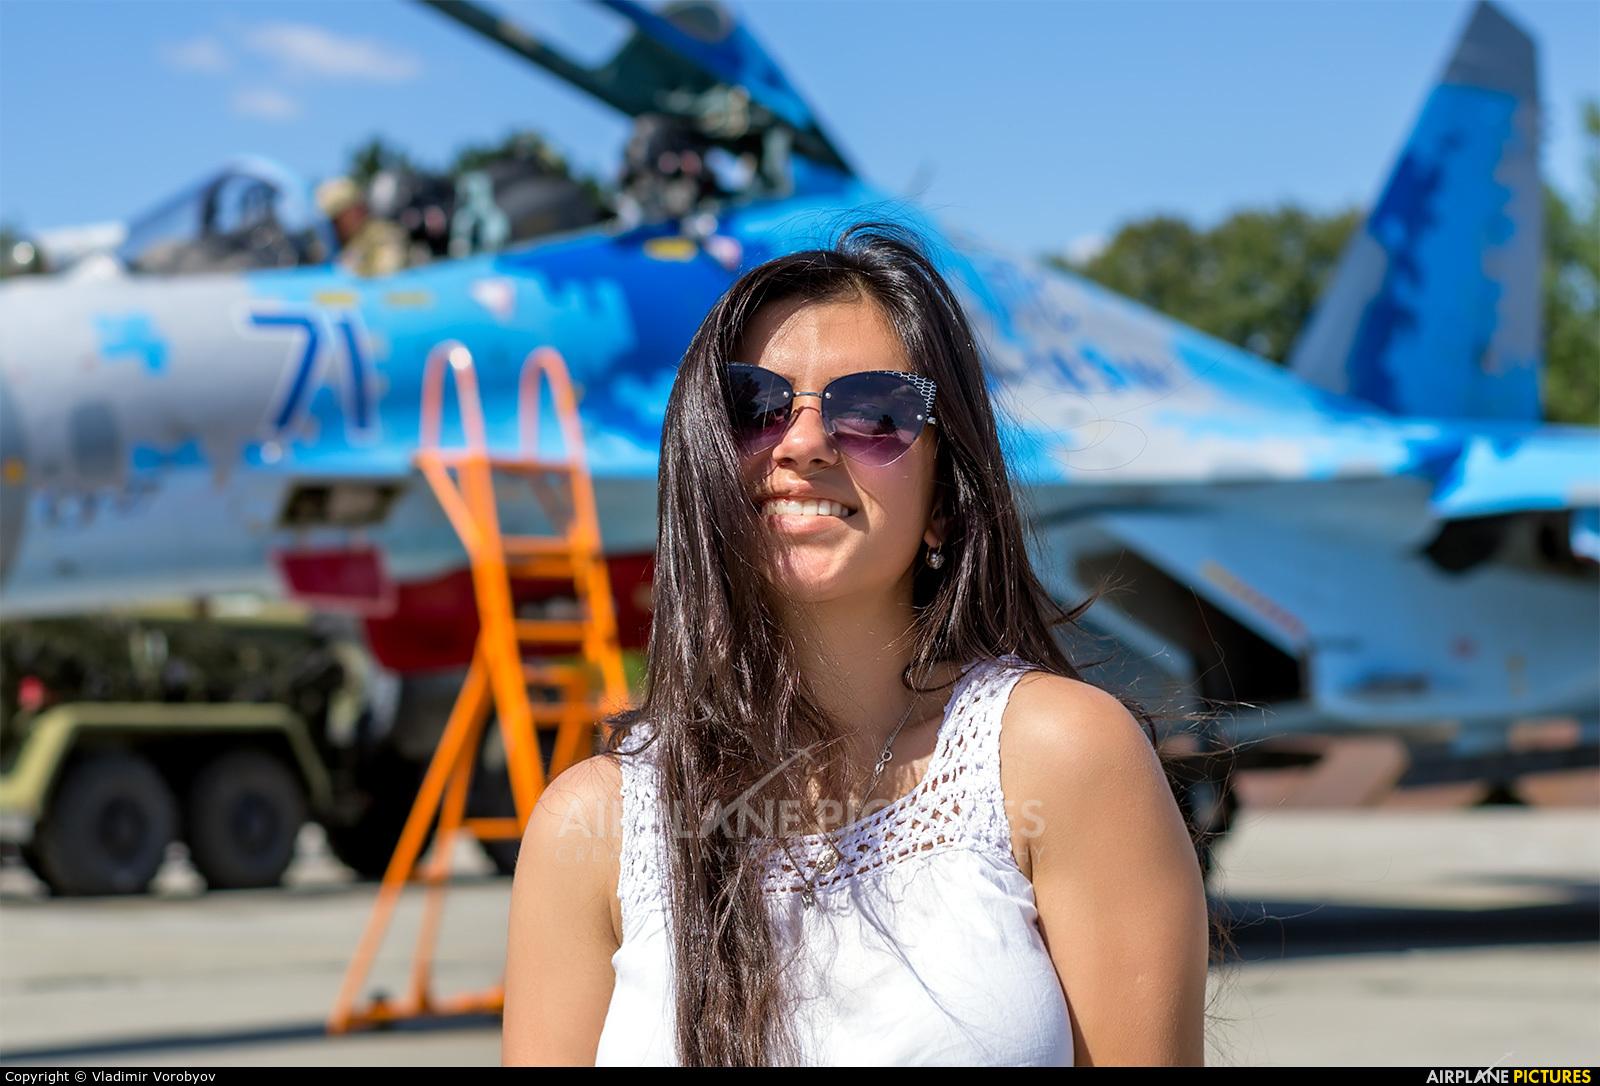 Ukraine - Air Force 71 BLUE aircraft at Ivano-Frankivsk Intl